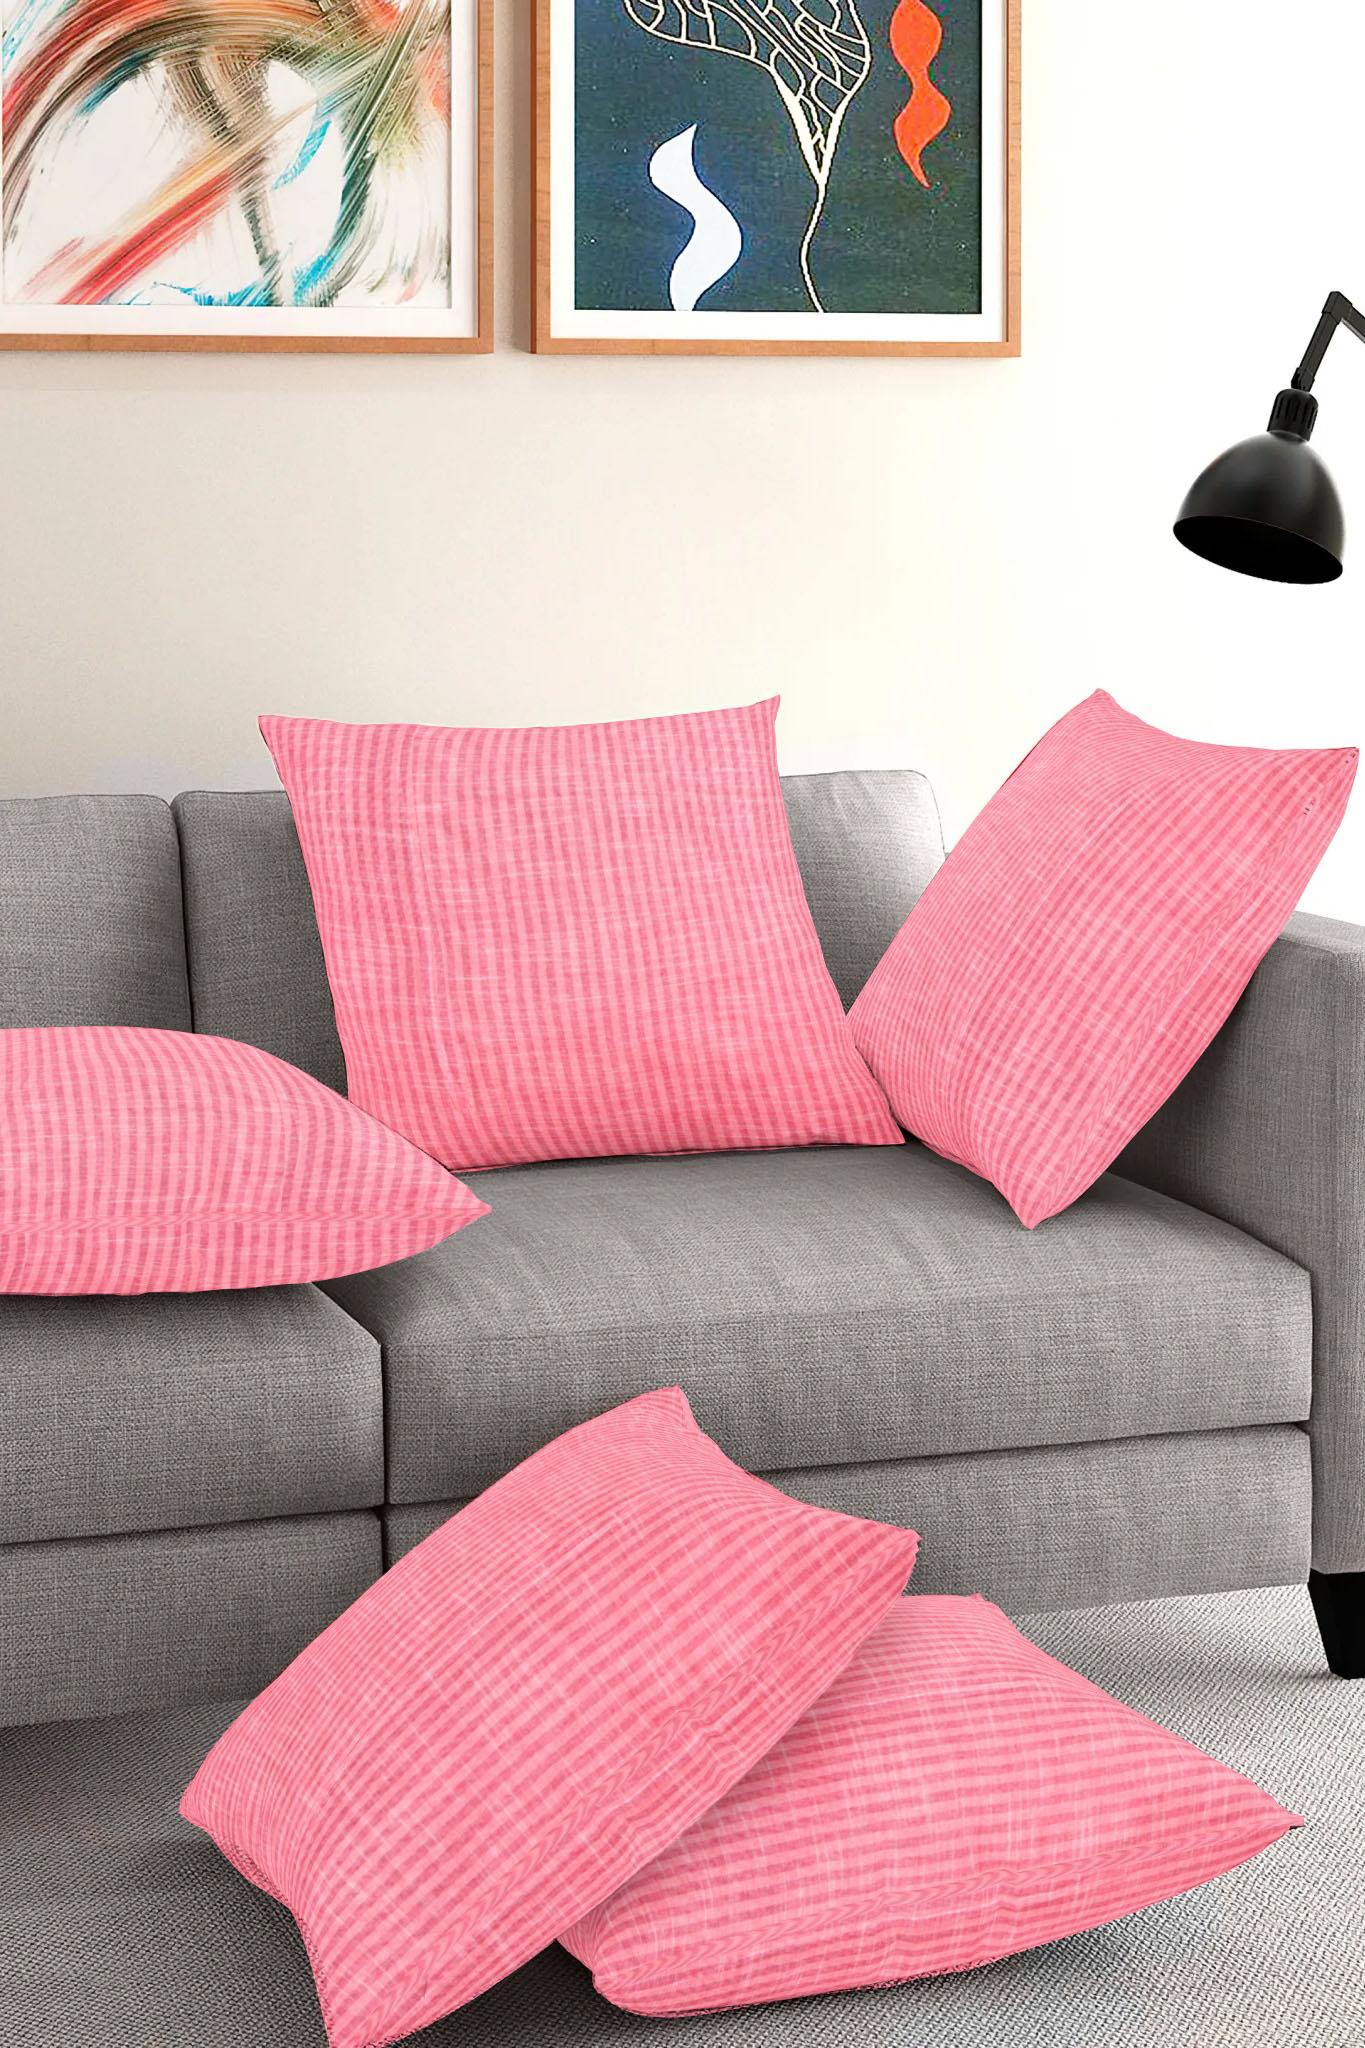 /home/customer/www/fabartcraft.com/public_html/uploadshttps://www.shopolics.com/uploads/images/medium/Pink-White-Cotton-Cushion-Cover-35376.jpg